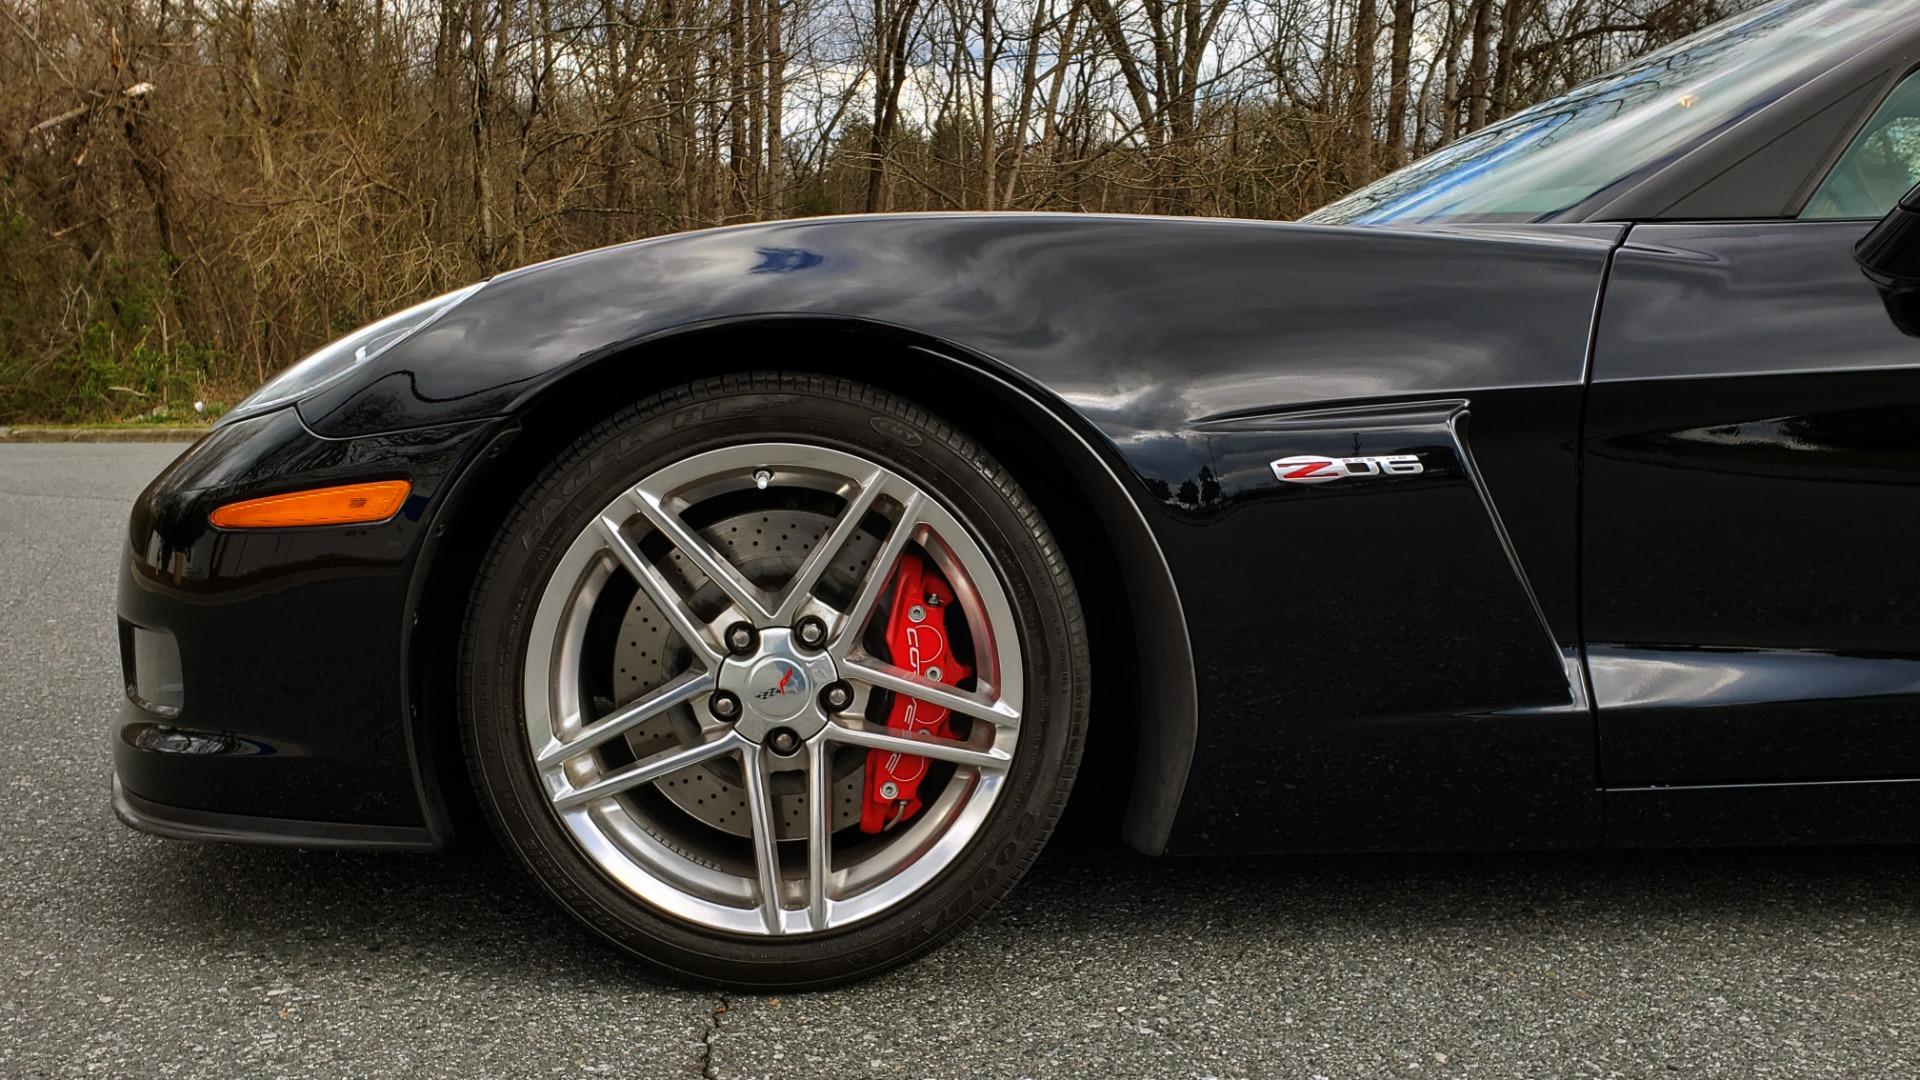 Used 2007 Chevrolet CORVETTE Z06 2LZ / 7.0L 427 V8 / 6-SPD MAN / BOSE / POLISHED WHEELS for sale Sold at Formula Imports in Charlotte NC 28227 93